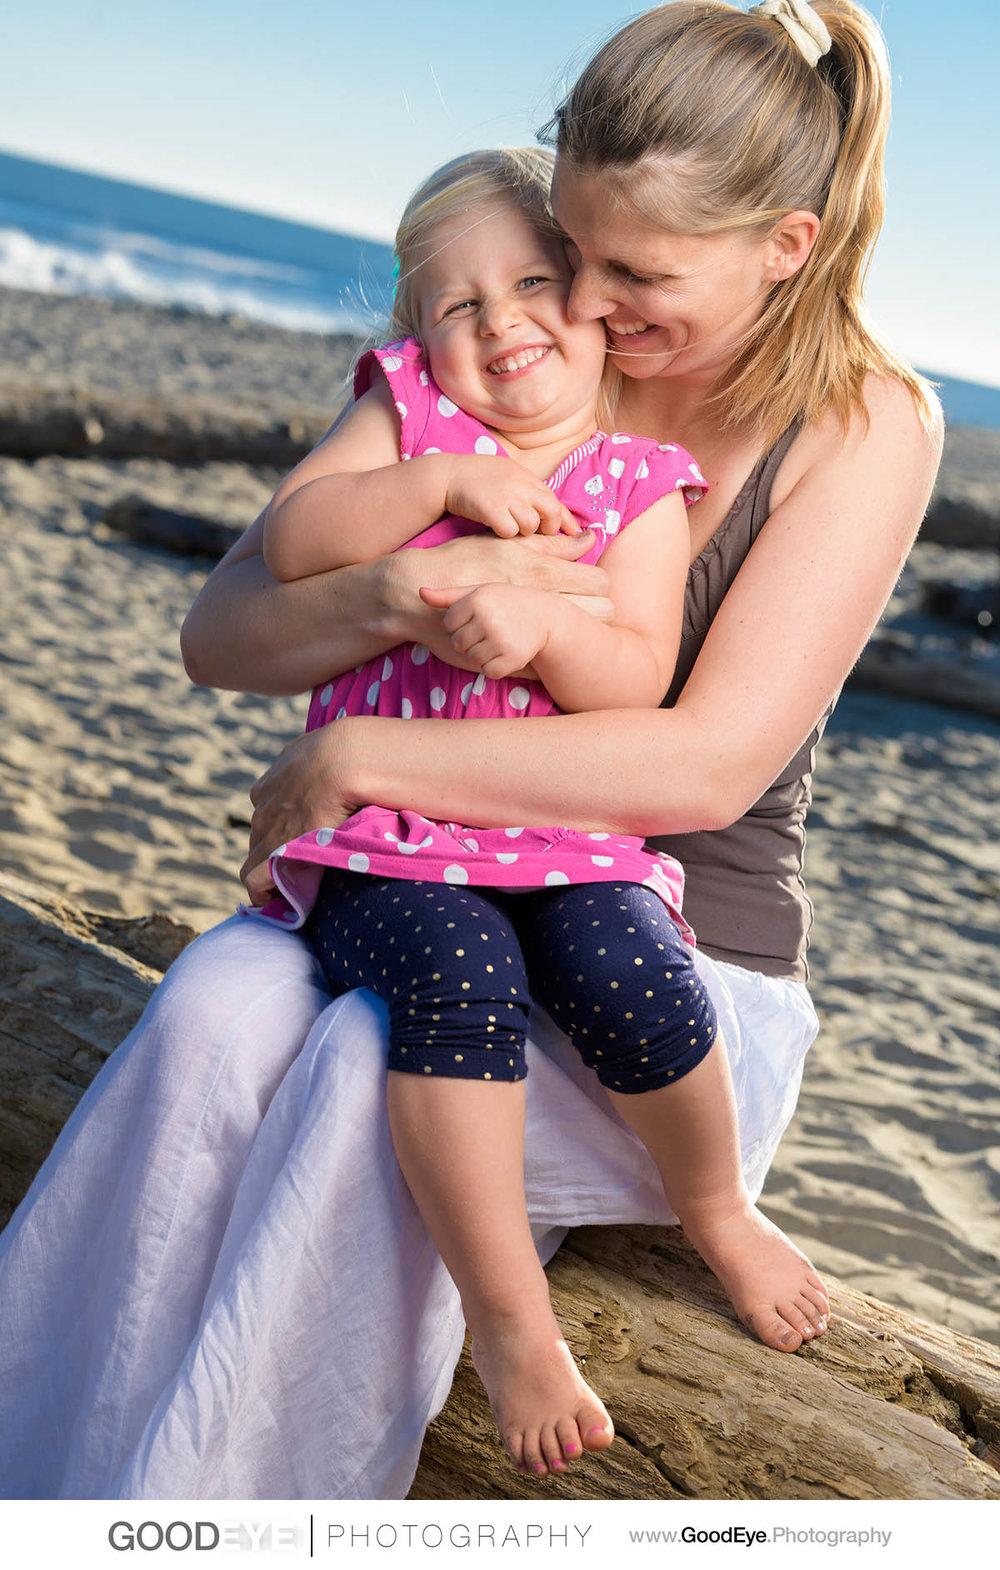 7600_Maja_and_Justin_Twin_Lakes_Beach_Santa_Cruz_Newborn_Family_Photogrraphy.jpg